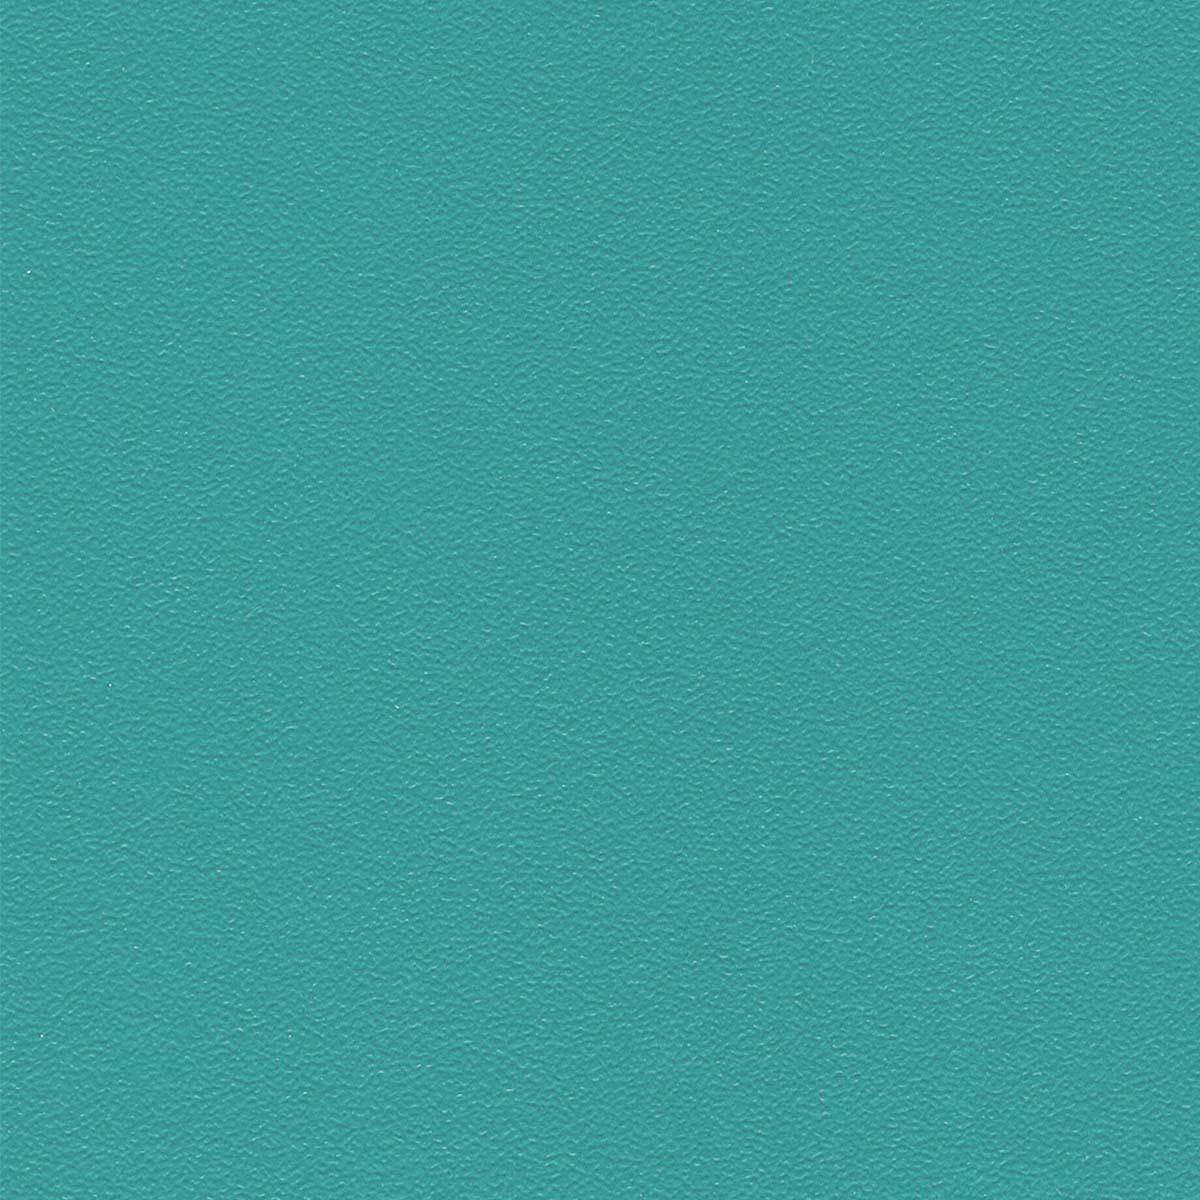 HF1961 VL Turquoise